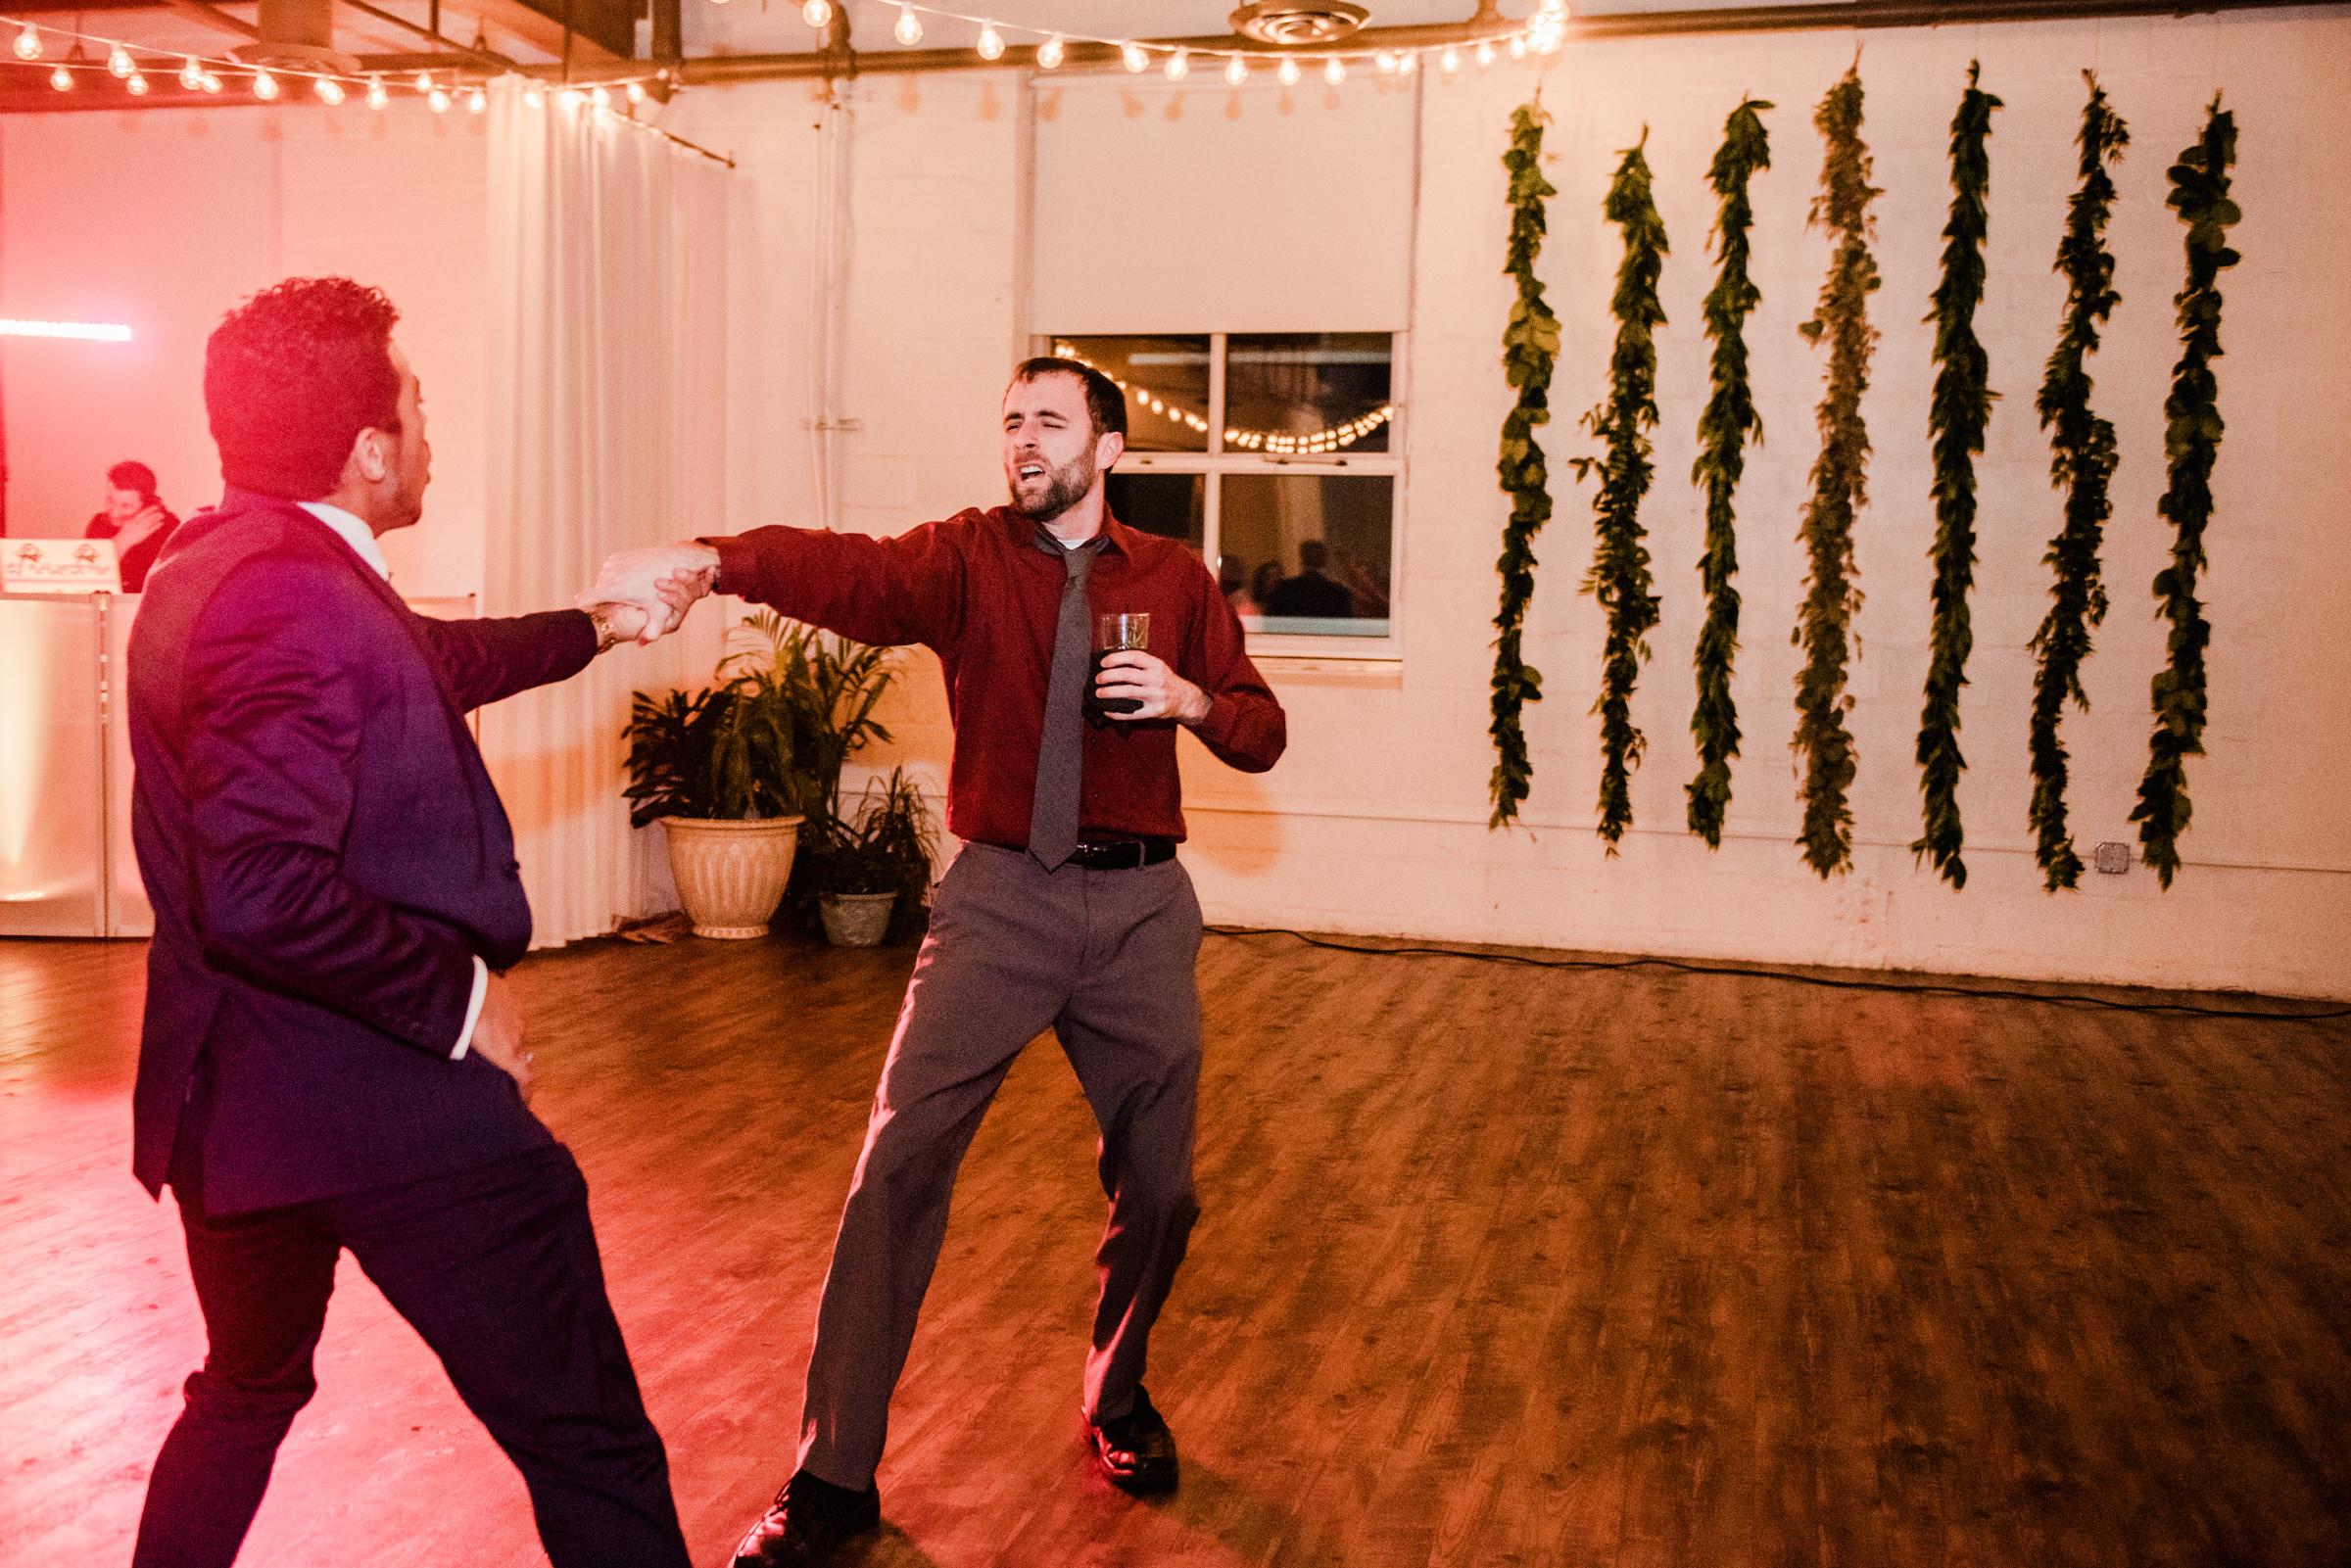 The_Arbor_LoftRochester_Wedding_JILL_STUDIO_Rochester_NY_Photographer_203736.jpg